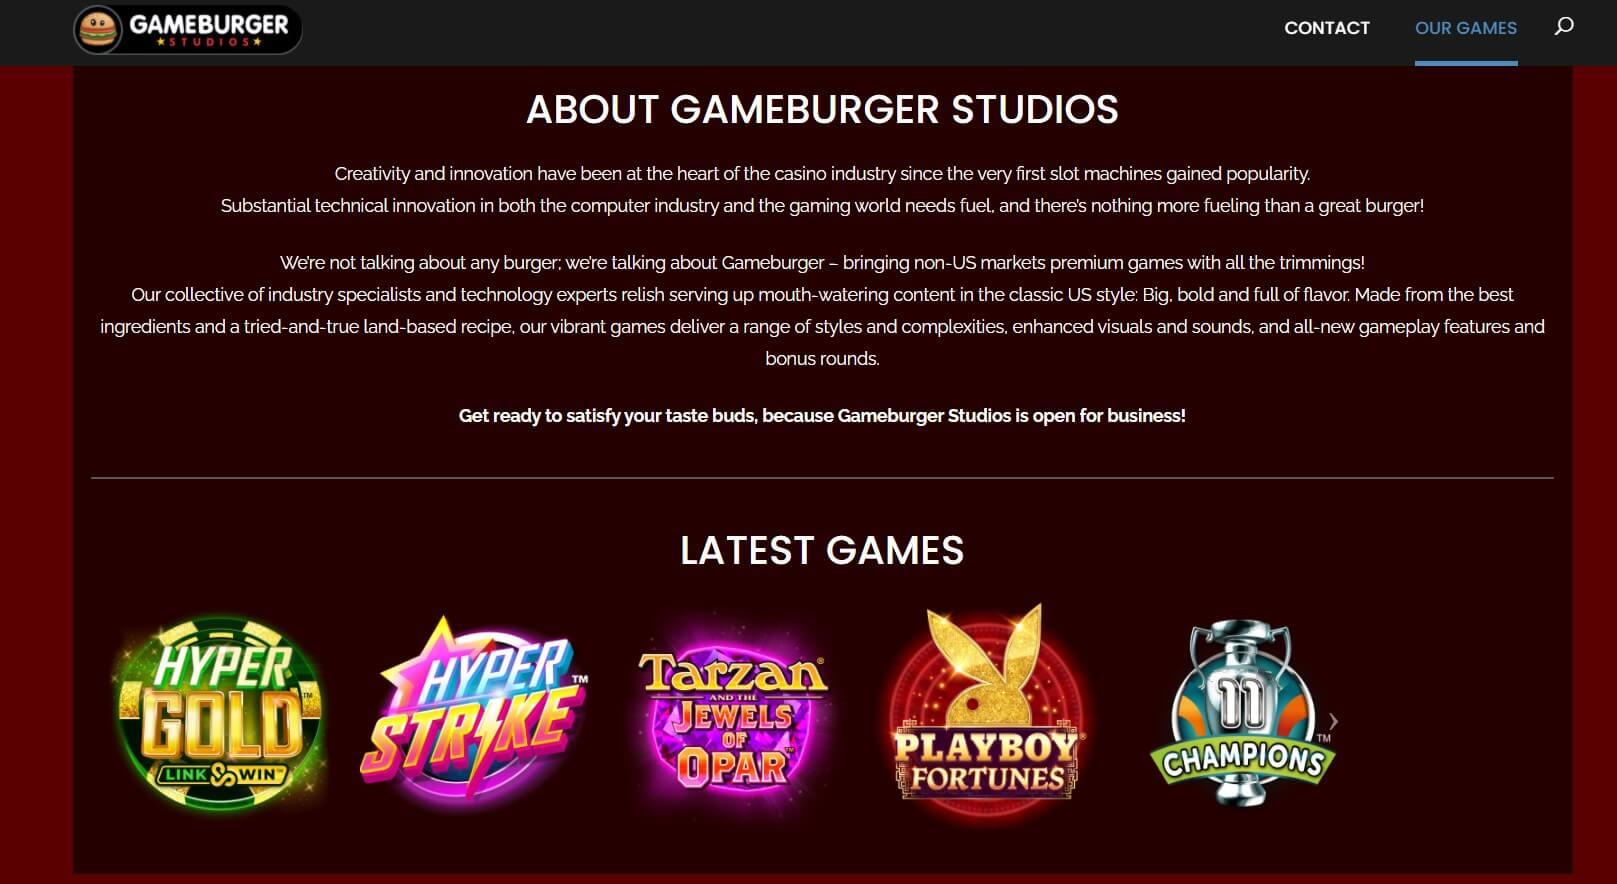 gameburger studios games